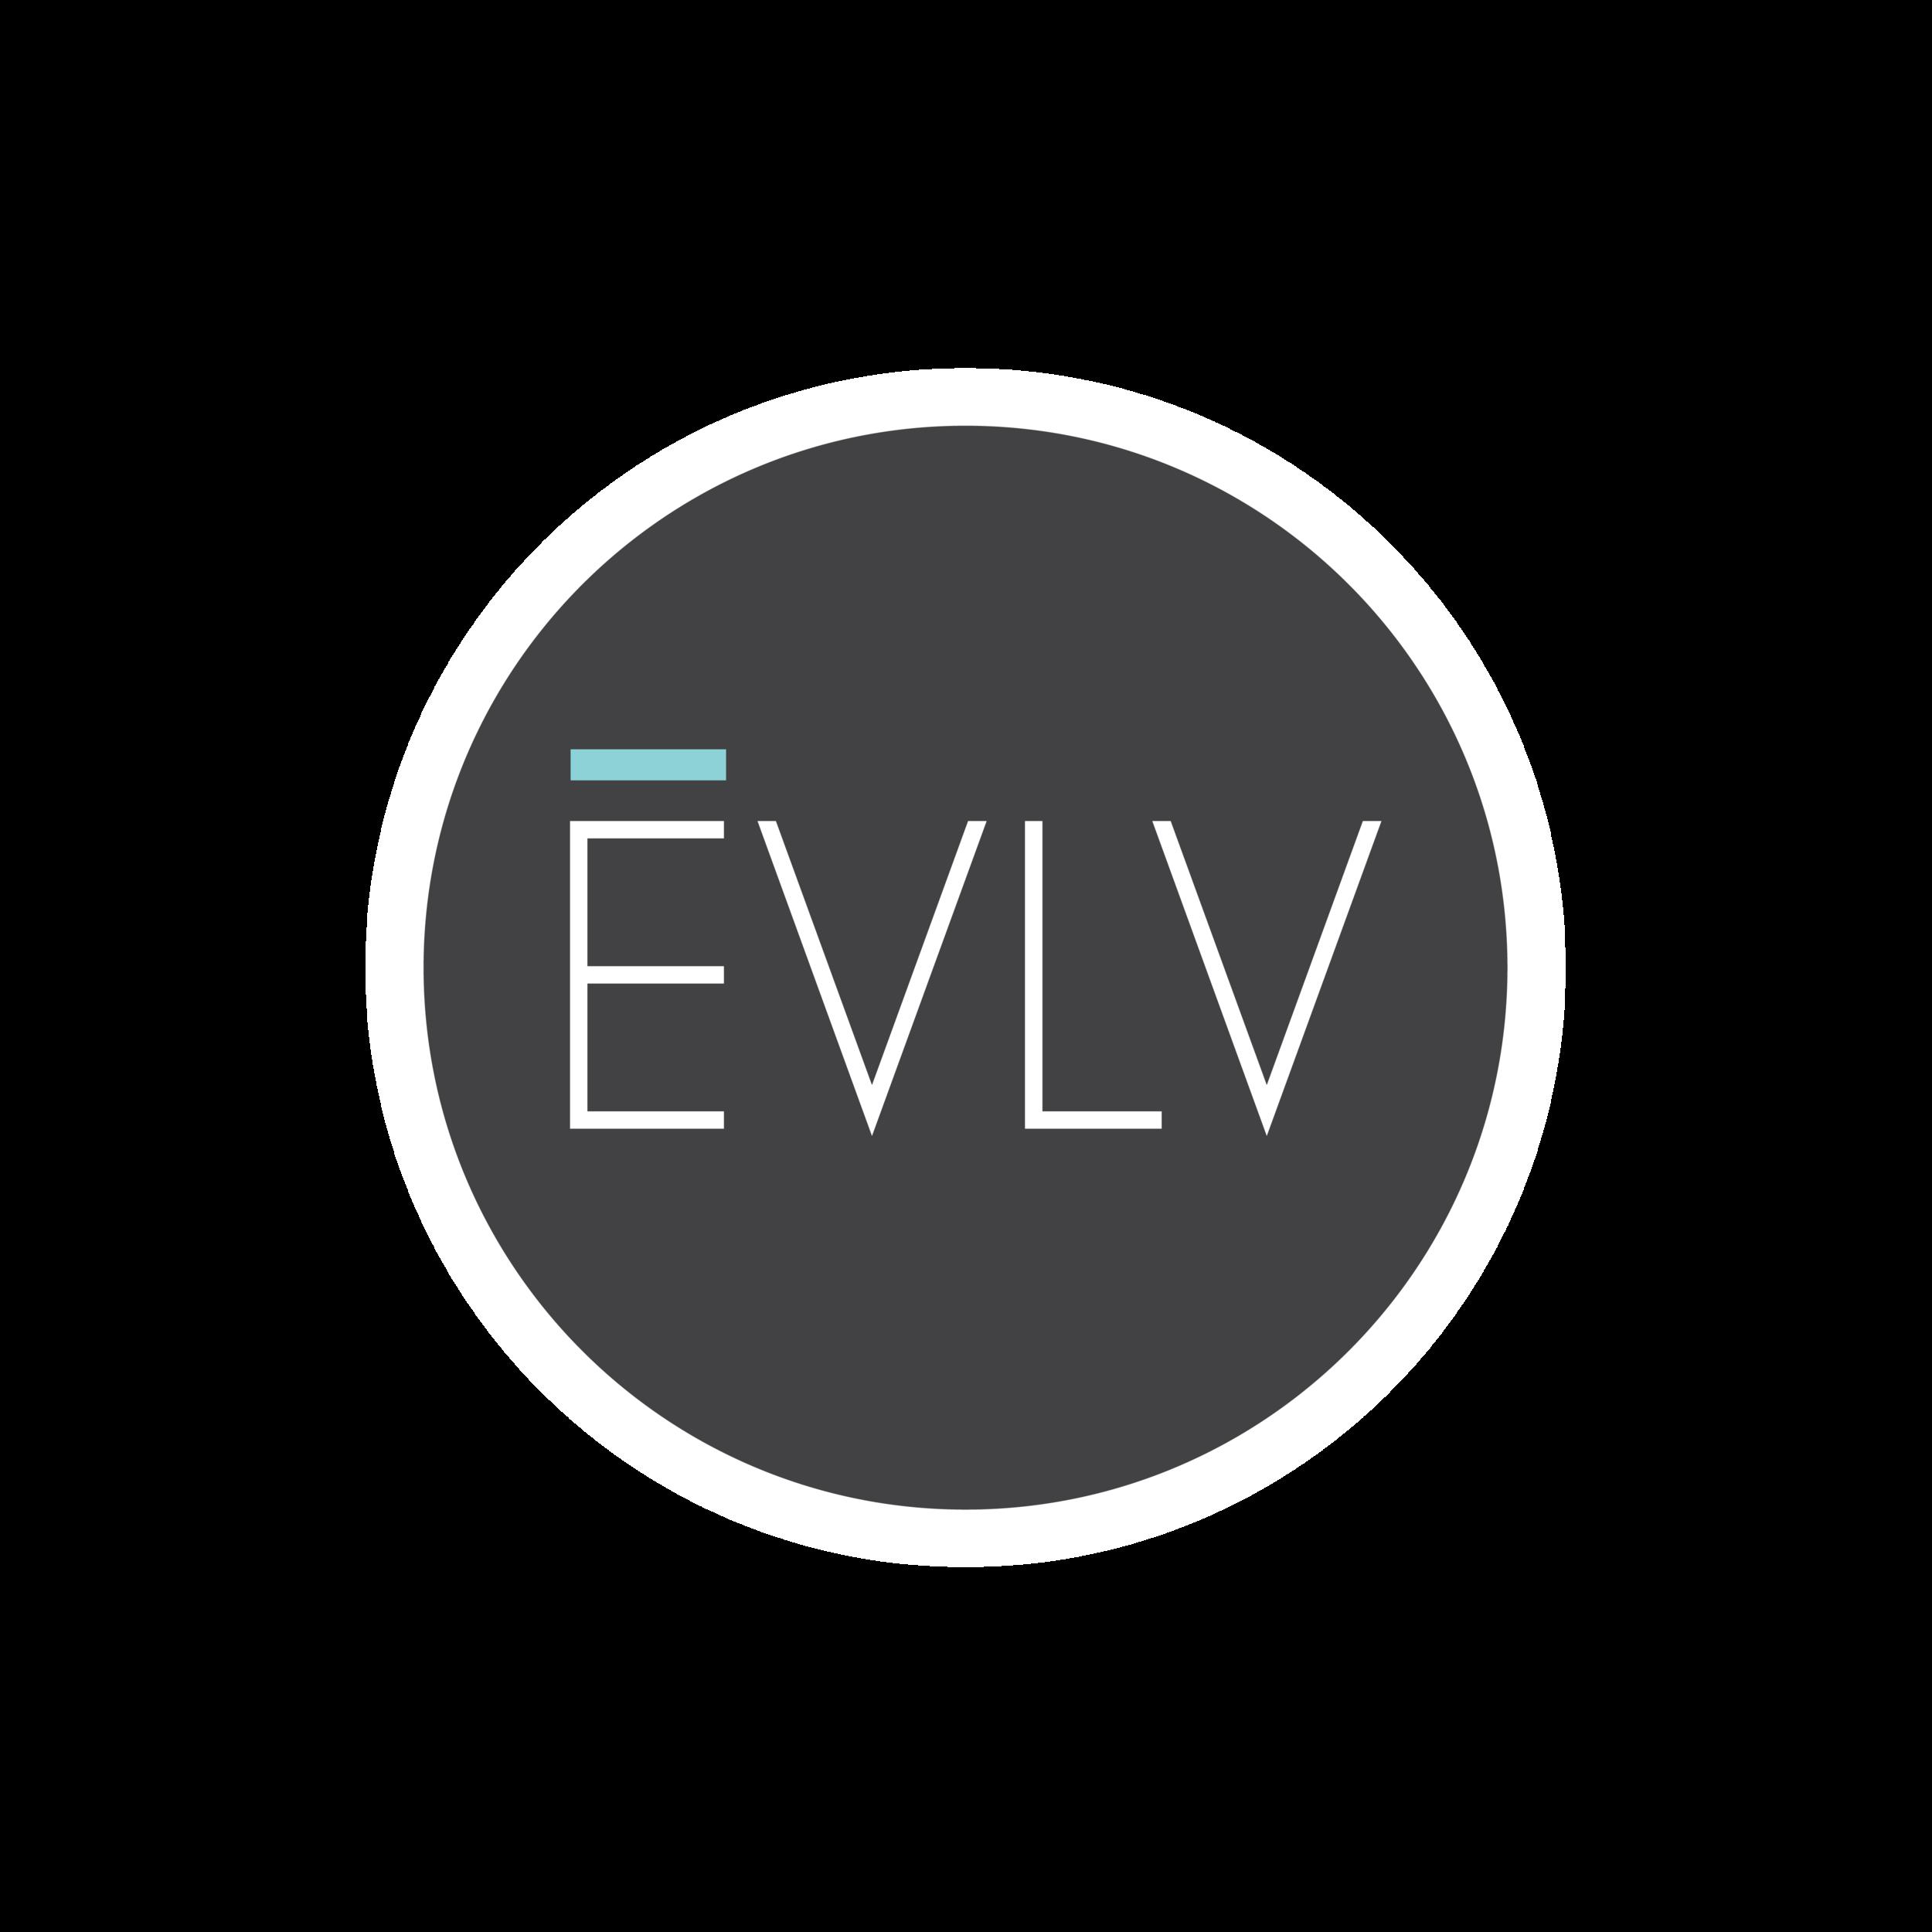 EVLV_Squarespace_Footer_logo-01.png